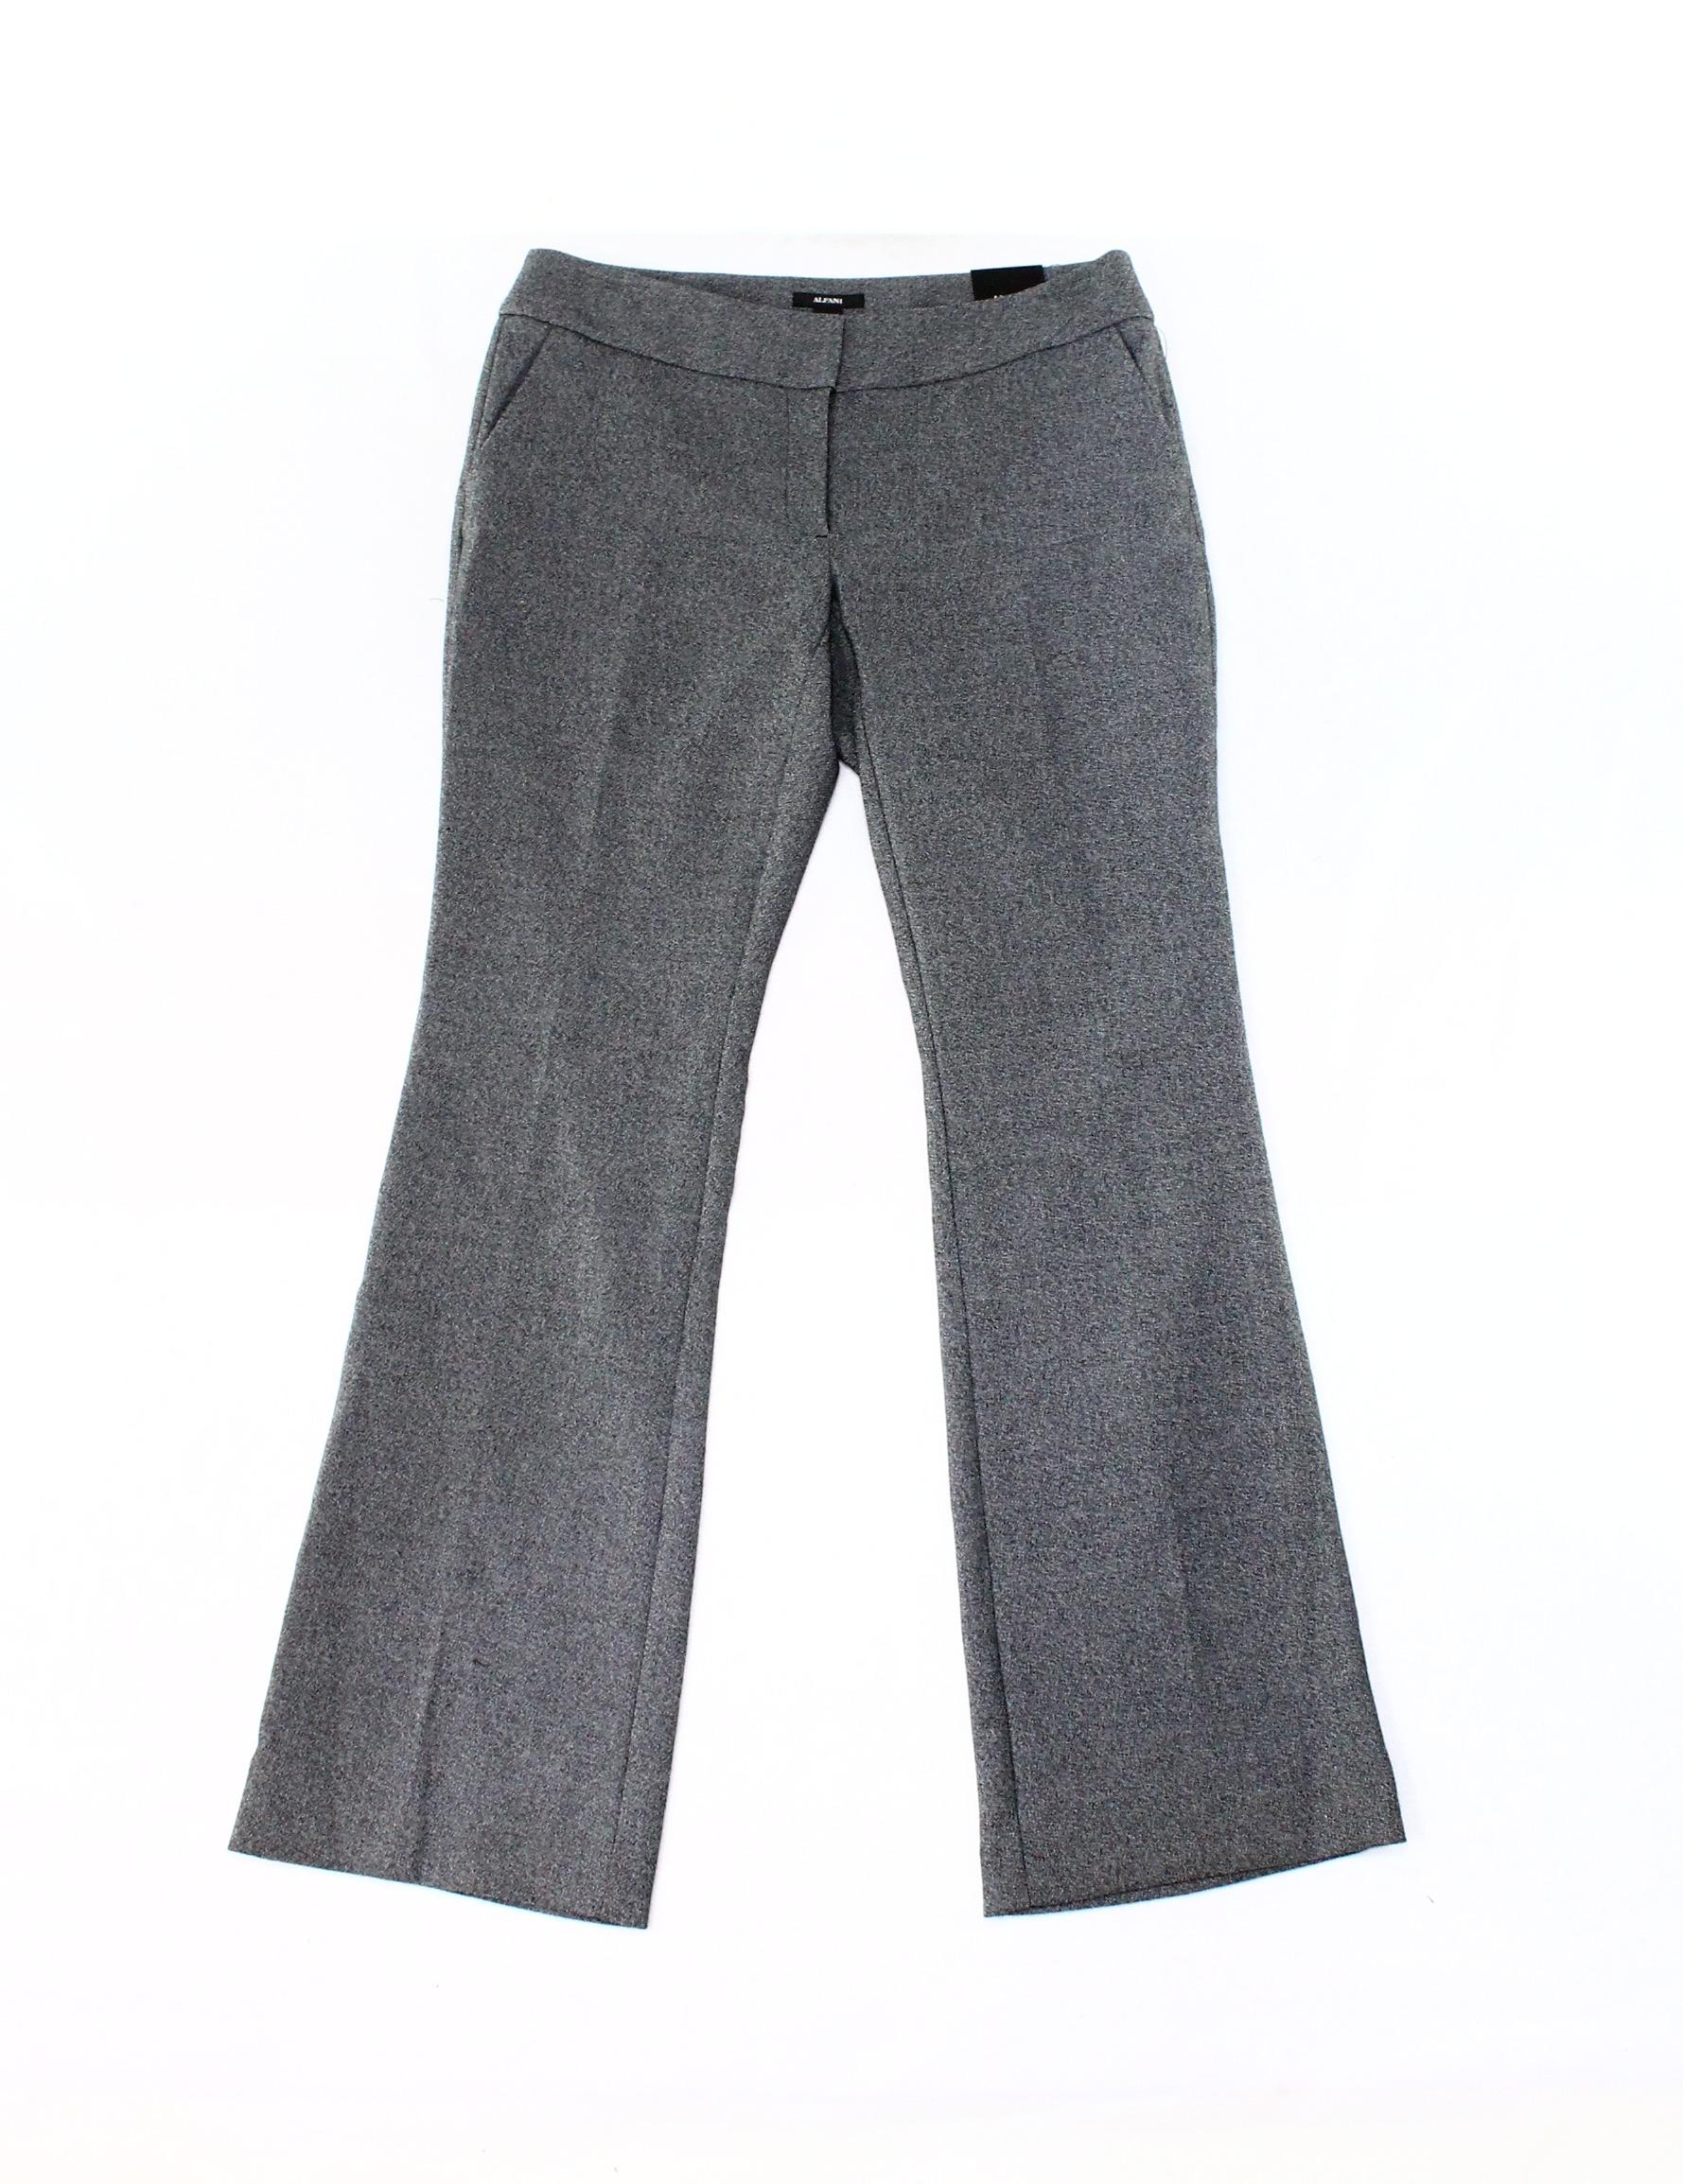 Alfani NEW Gray Womens Size 6 Bootcut Leg Marled Trouser Dress Pants